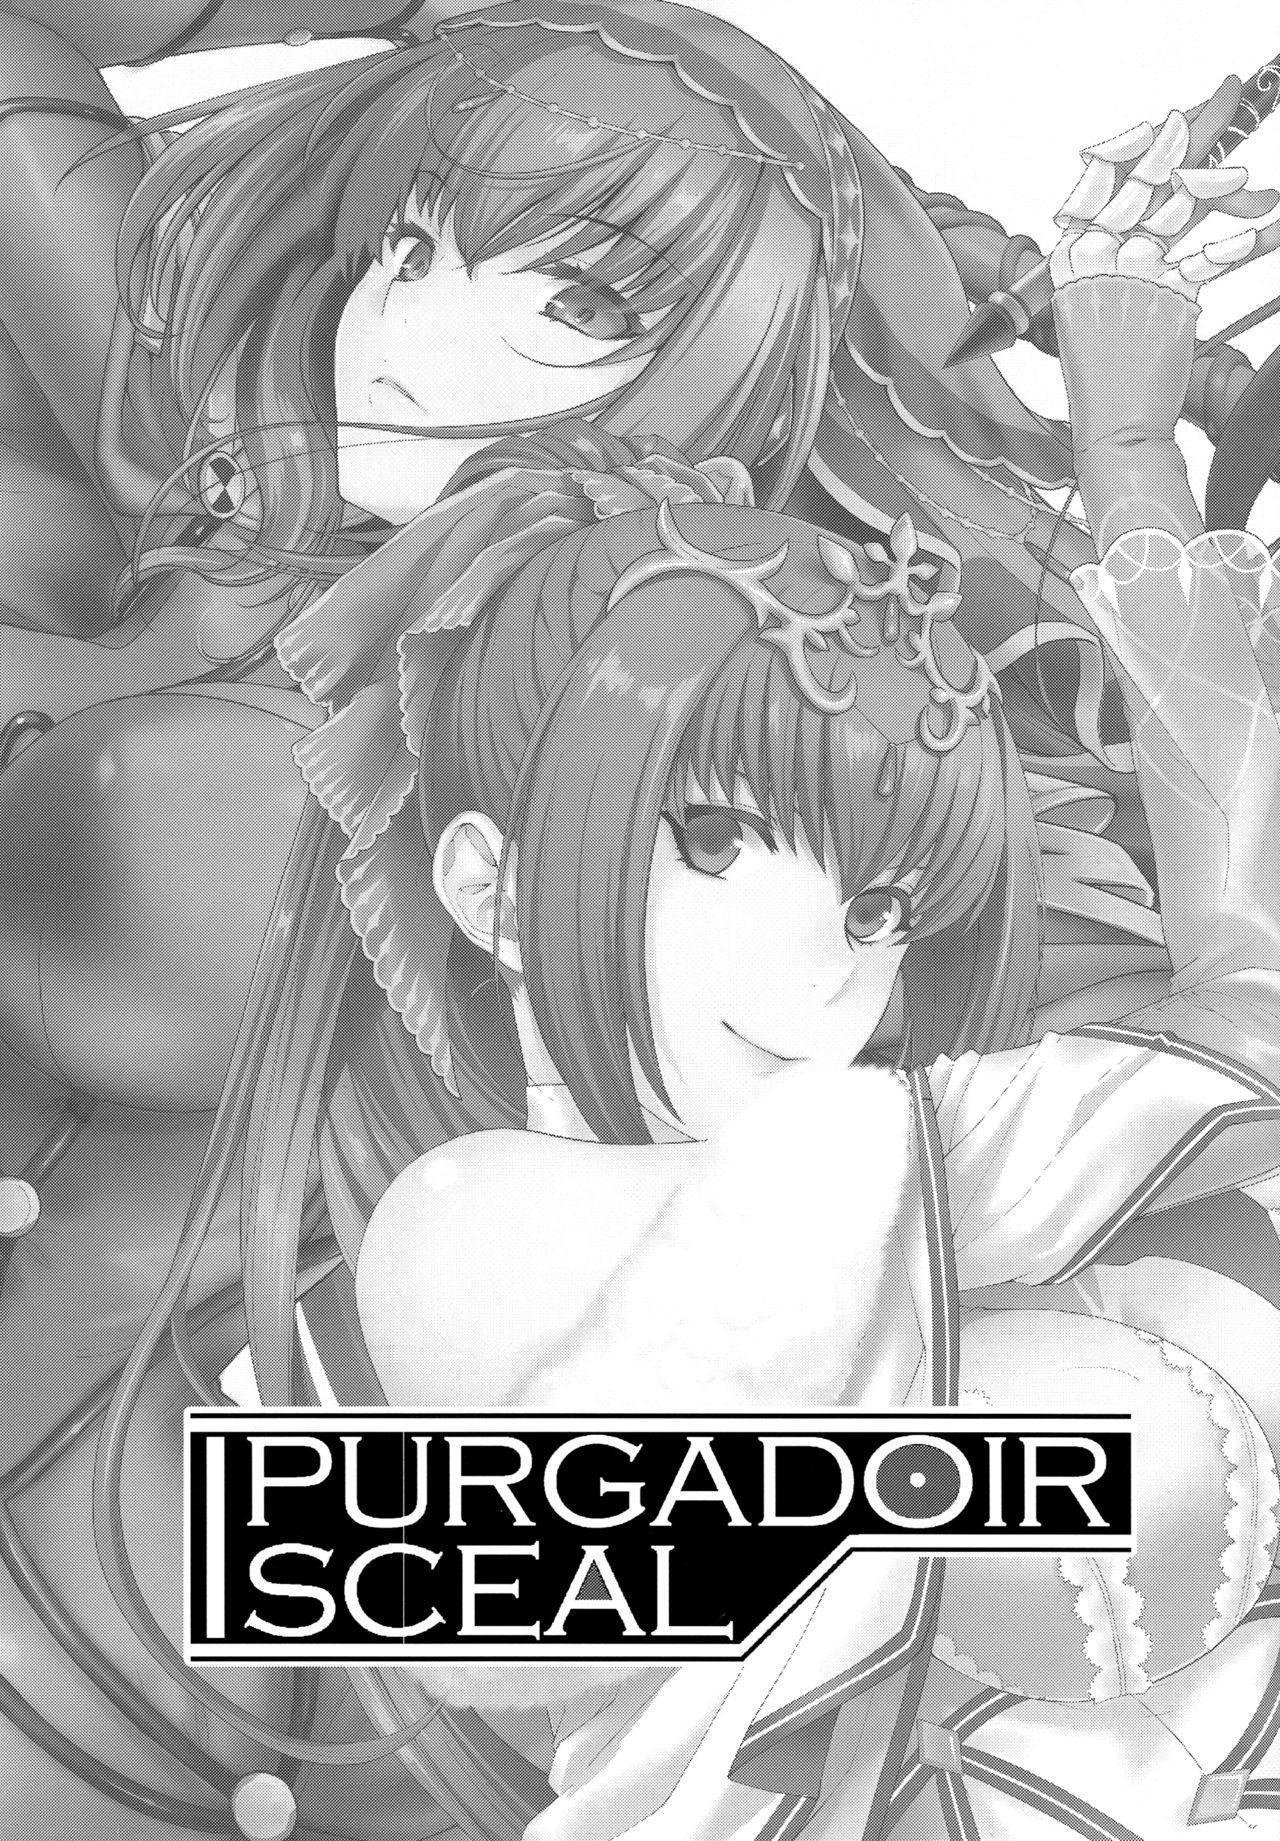 PURGADOIR SCEAL 2